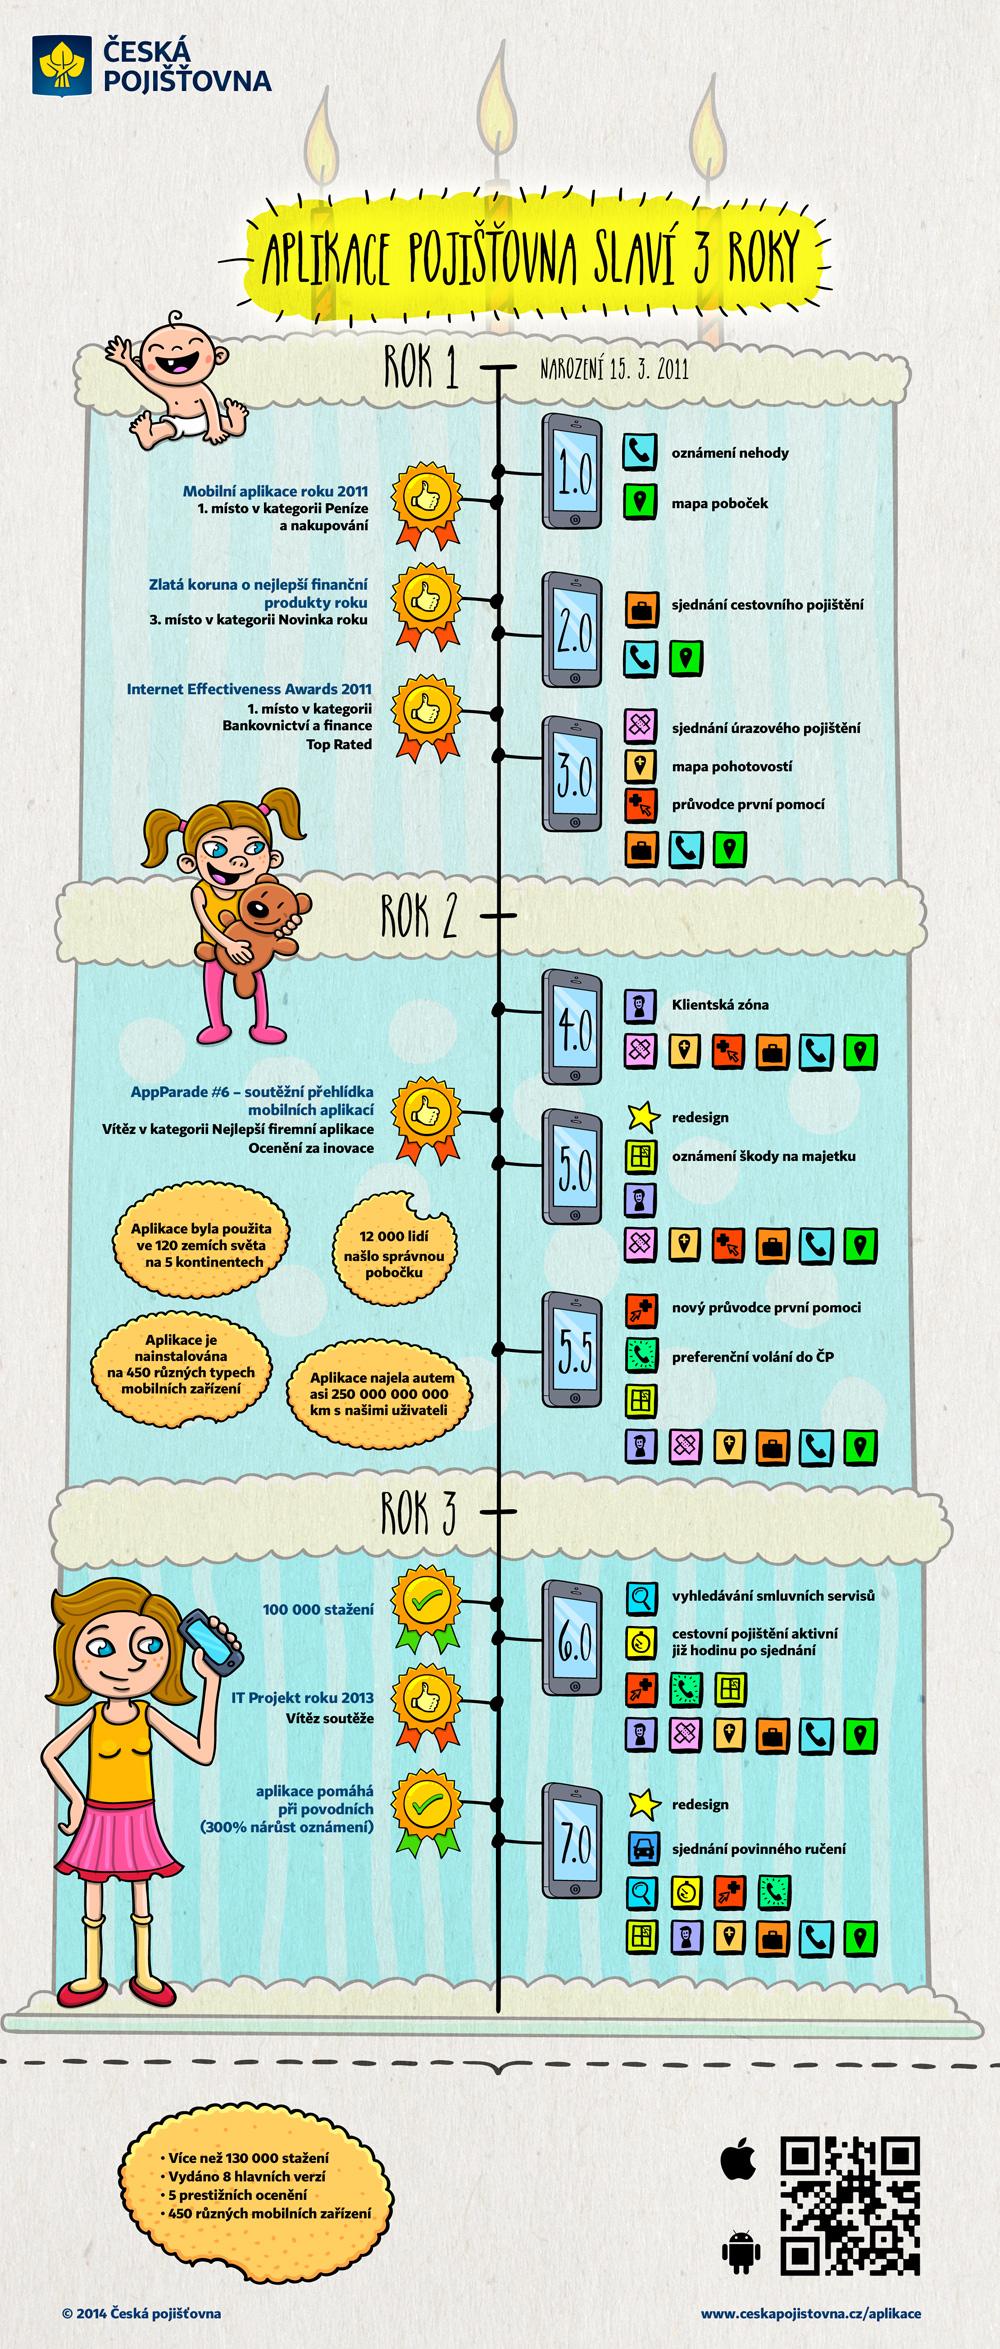 Aplikace_Pojistovna_3_narozeniny_infografika_(03-2014)